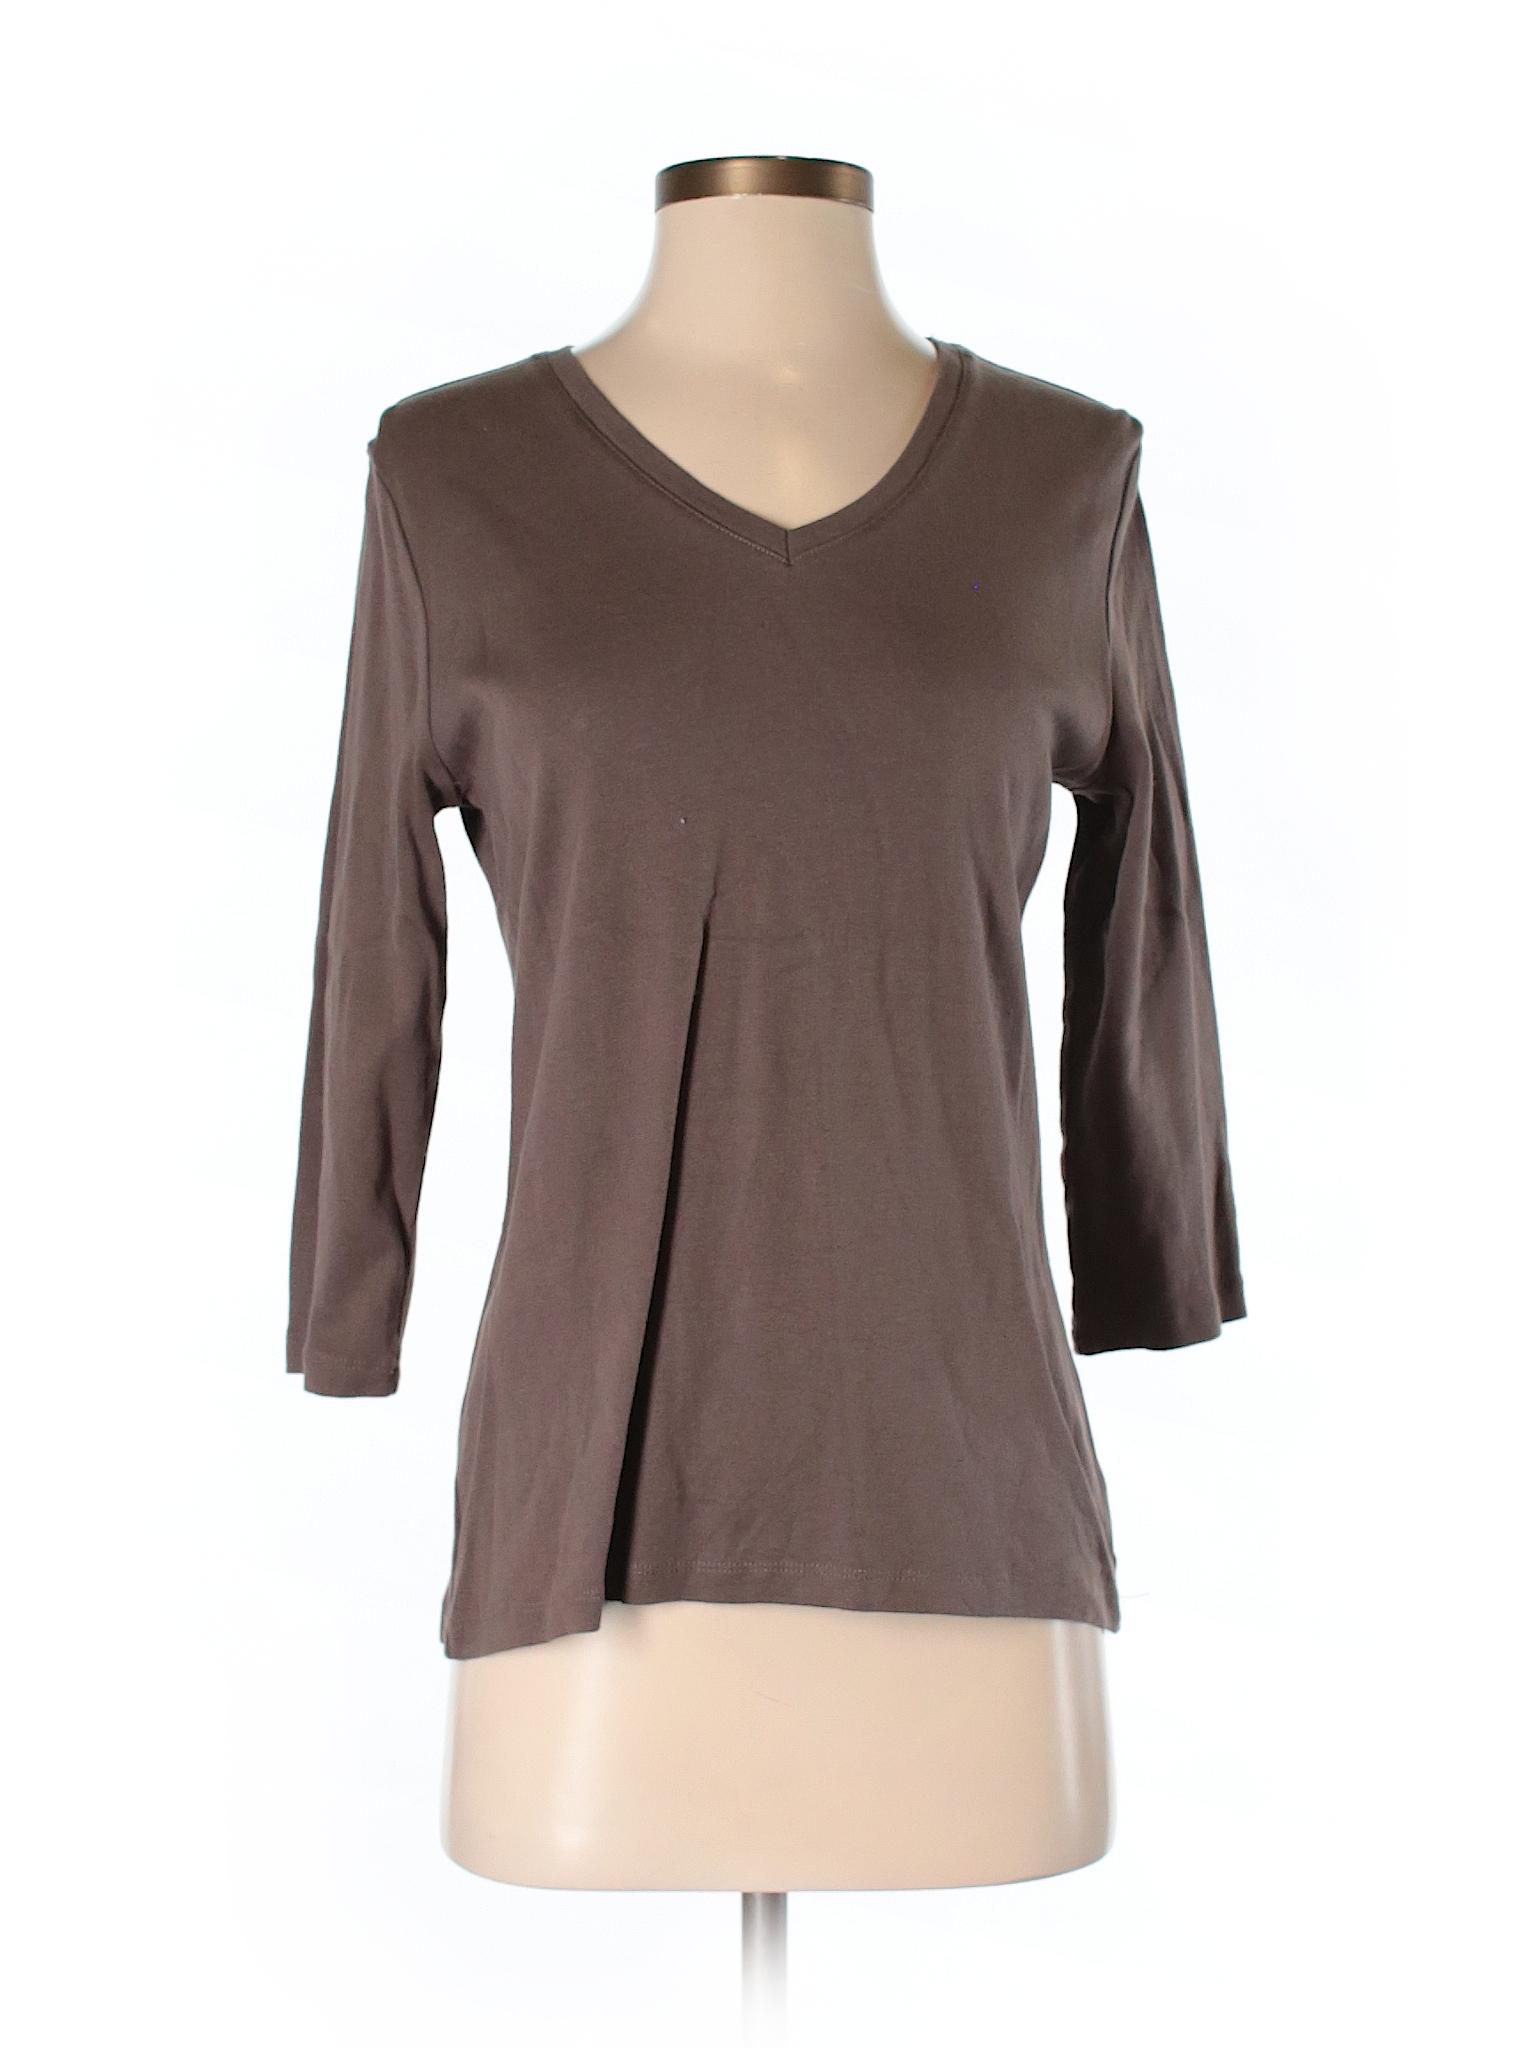 St John 39 S Bay 3 4 Sleeve T Shirt 80 Off Only On Thredup